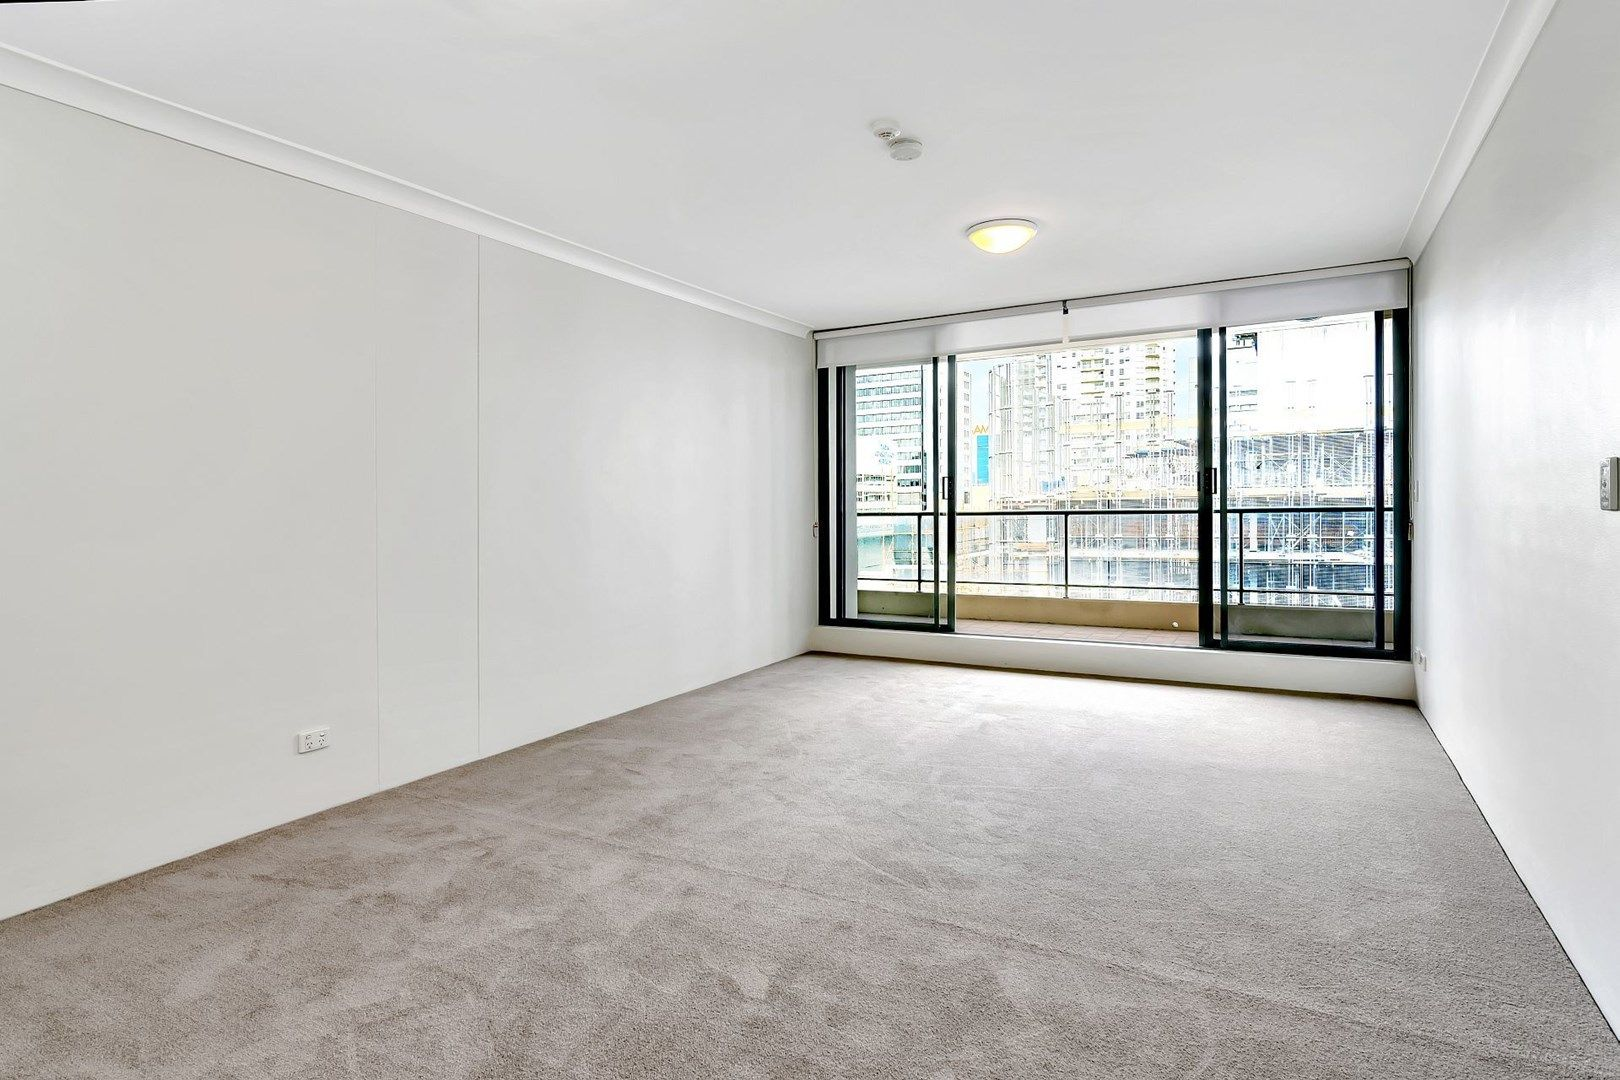 706/37-39 Mclaren Street, North Sydney NSW 2060, Image 1